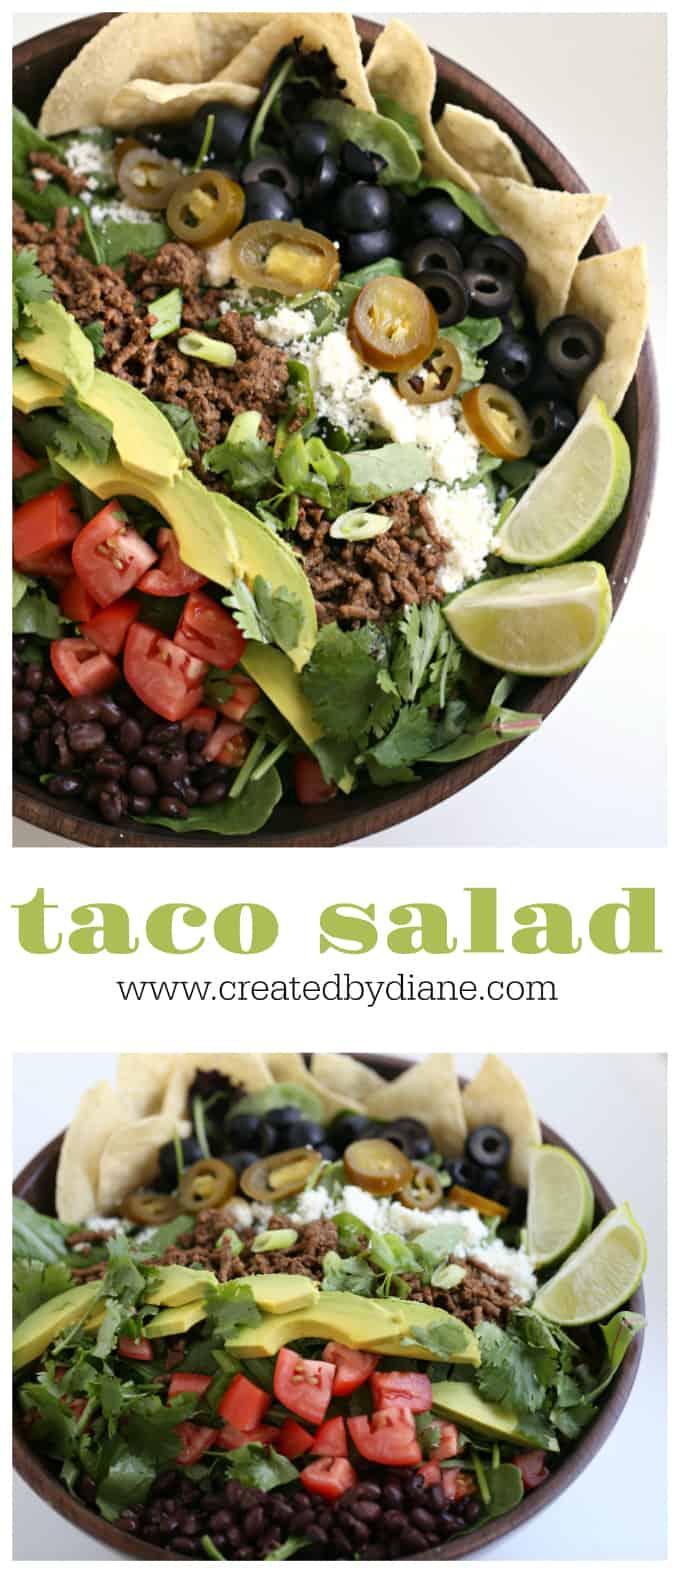 taco salad recipe www.createdbydiane.com